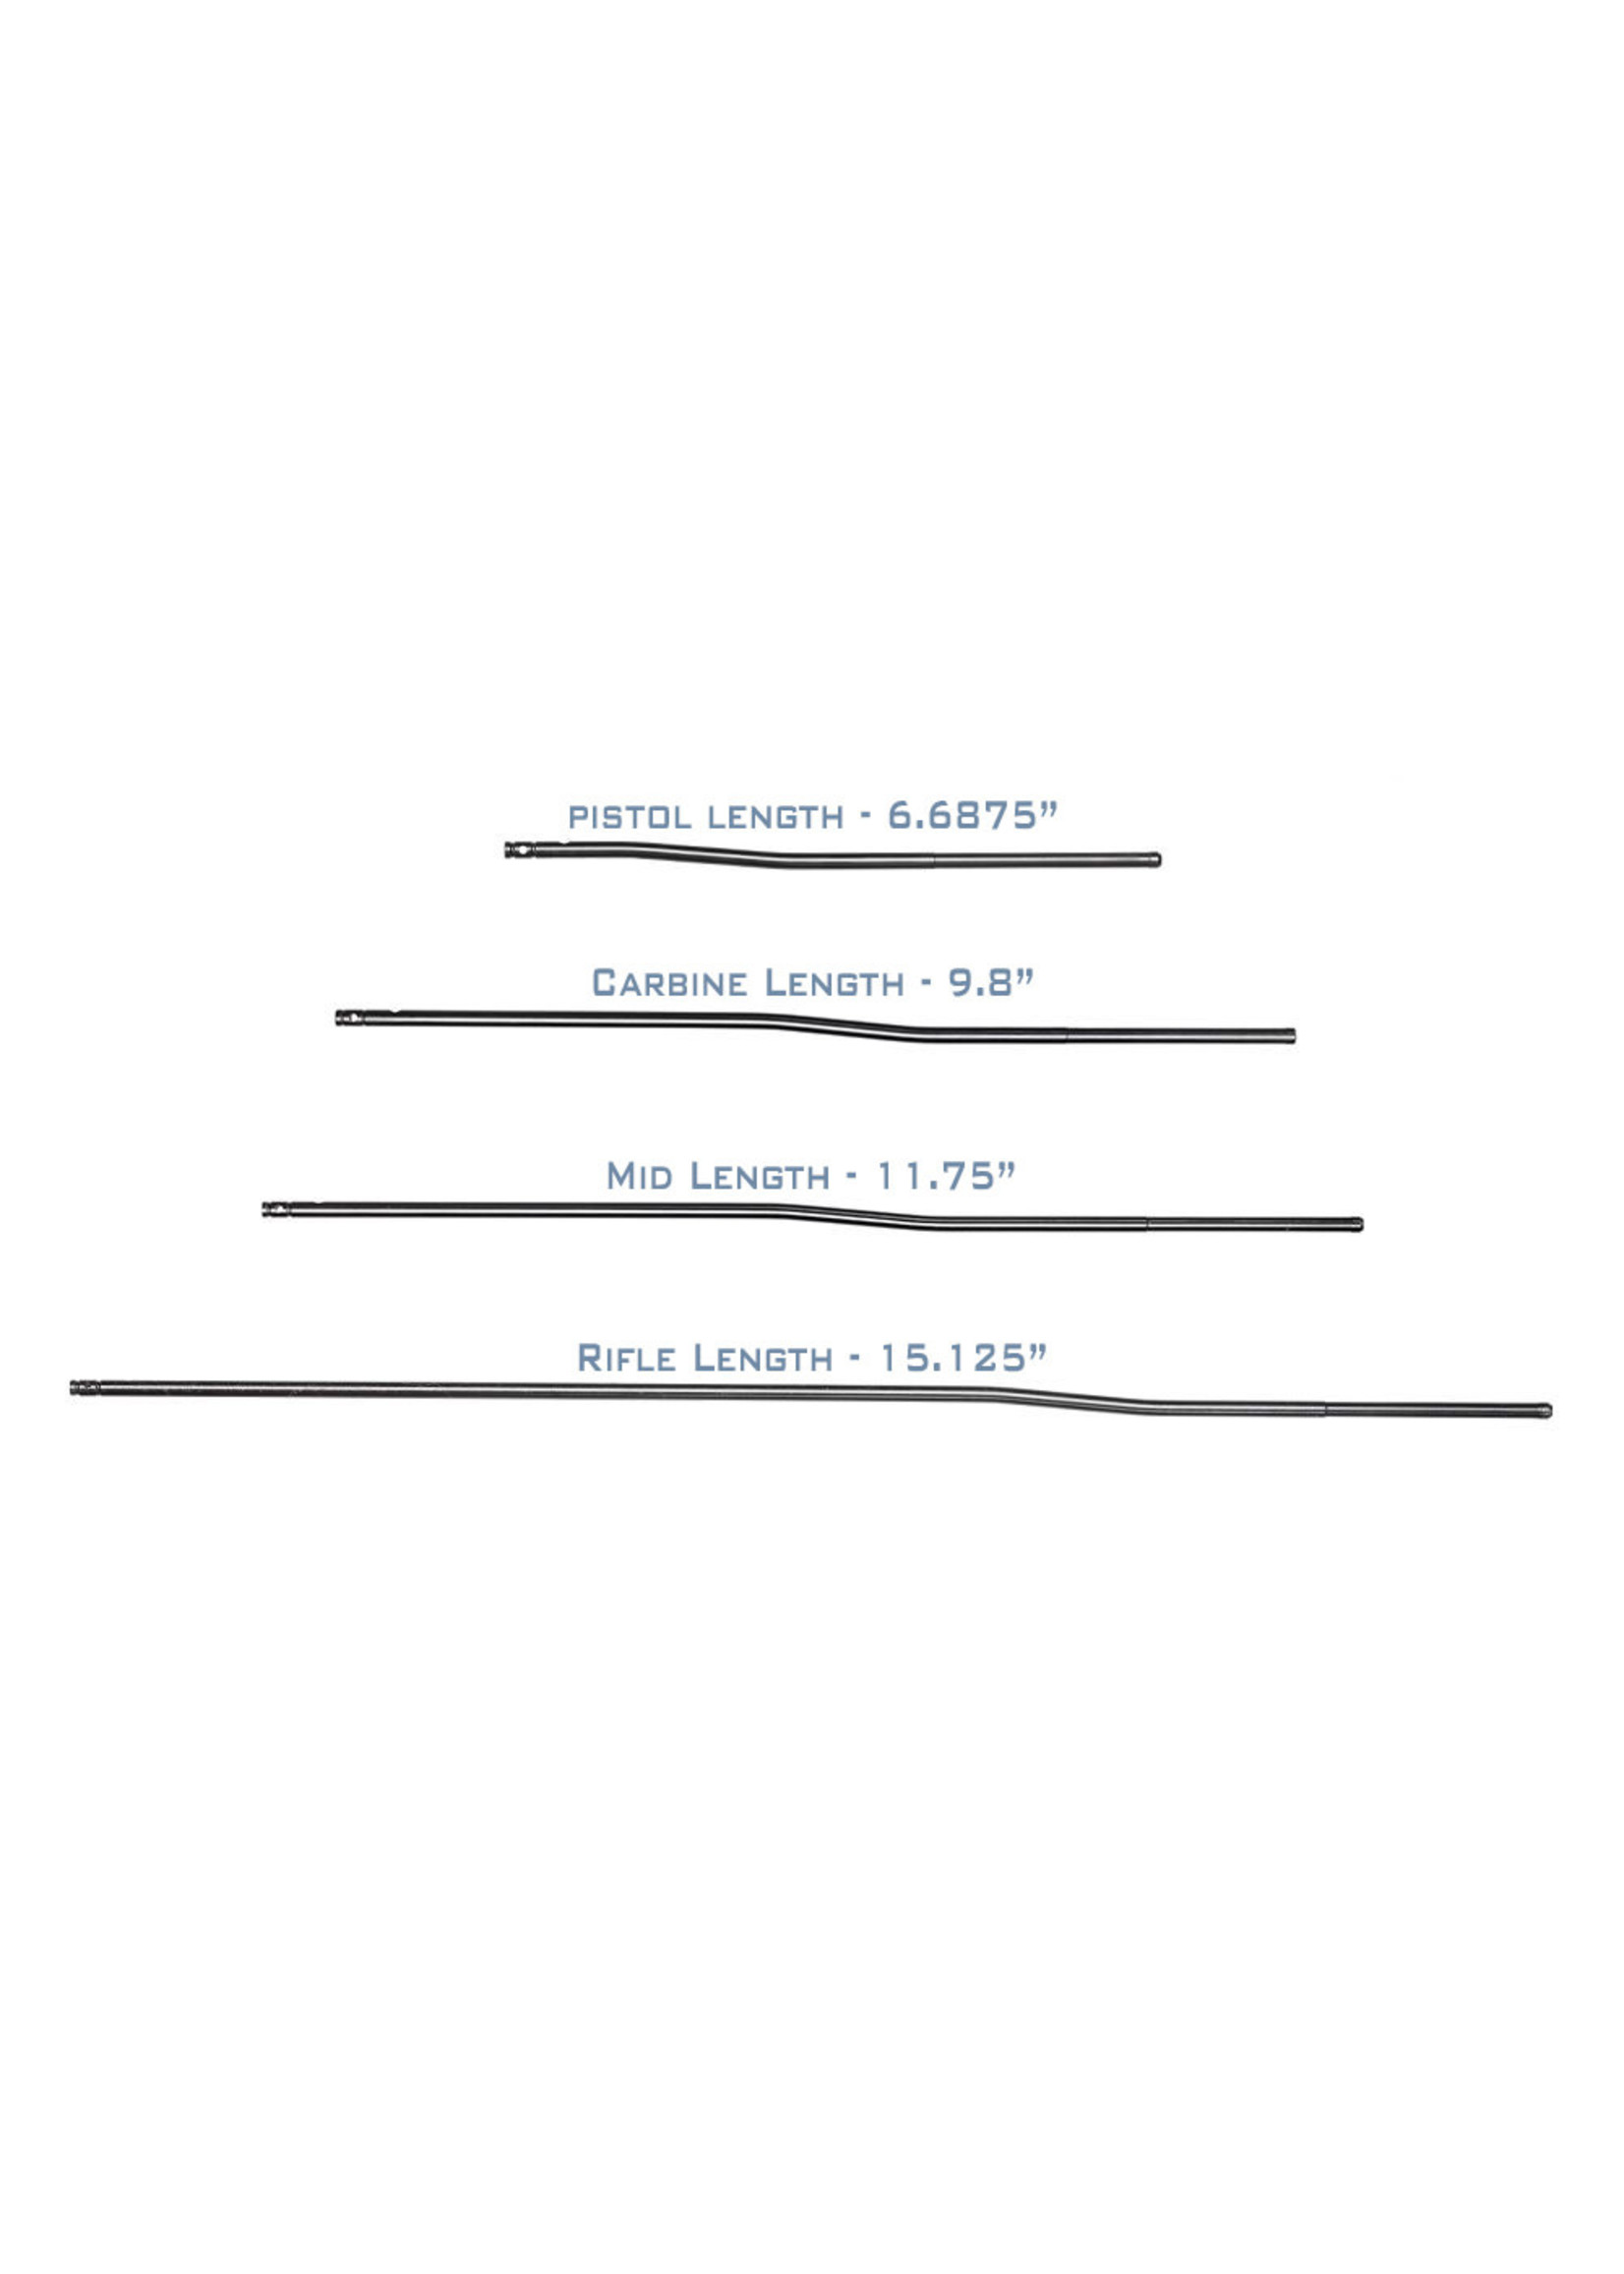 "Aero Precision Aero Precision Melonite Gas Tubes, Pistol-Length, 6.6875"""